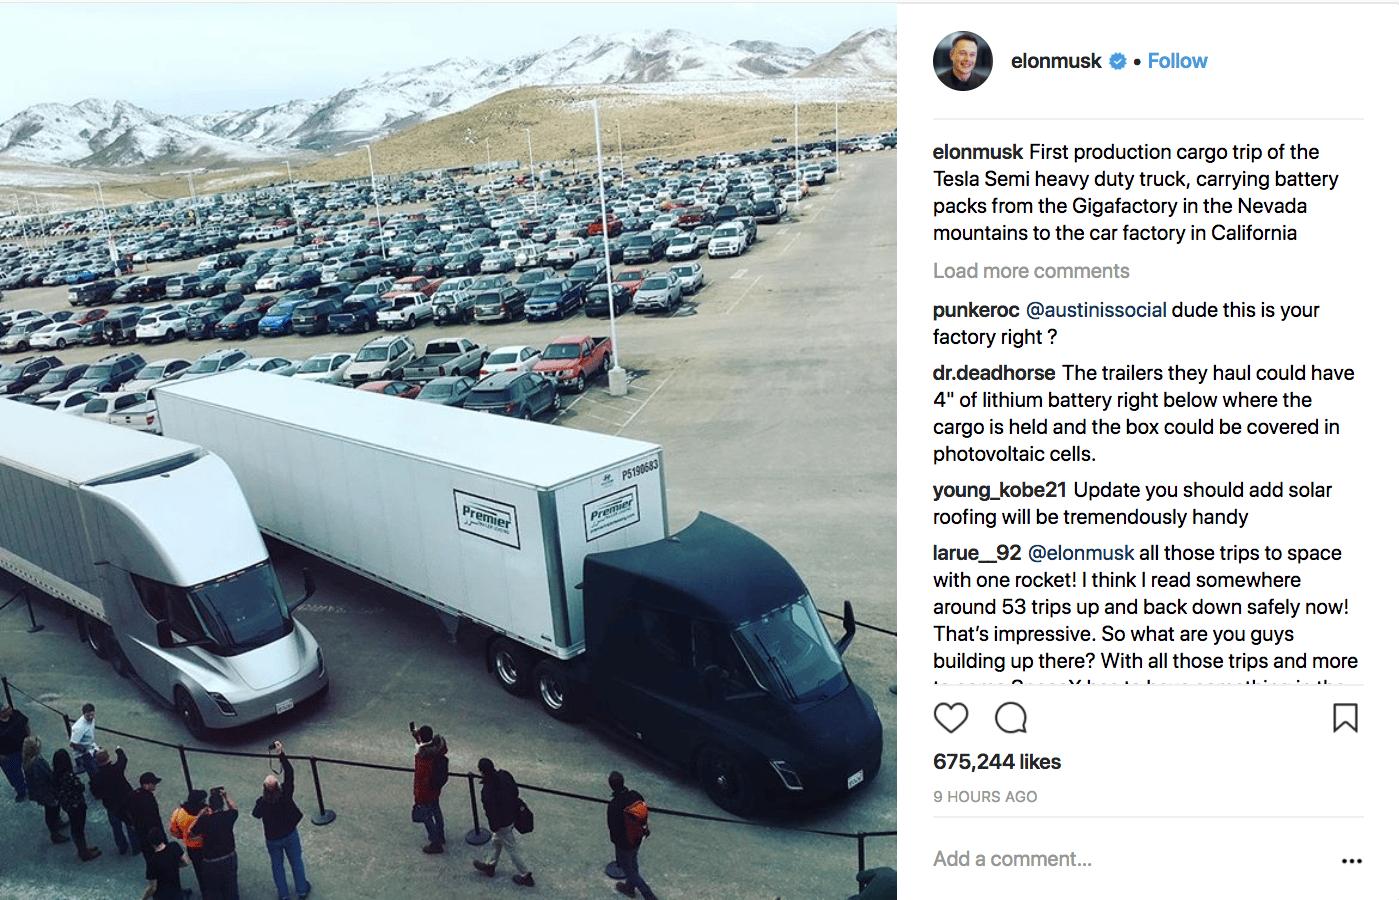 Elon Musk on Instagram